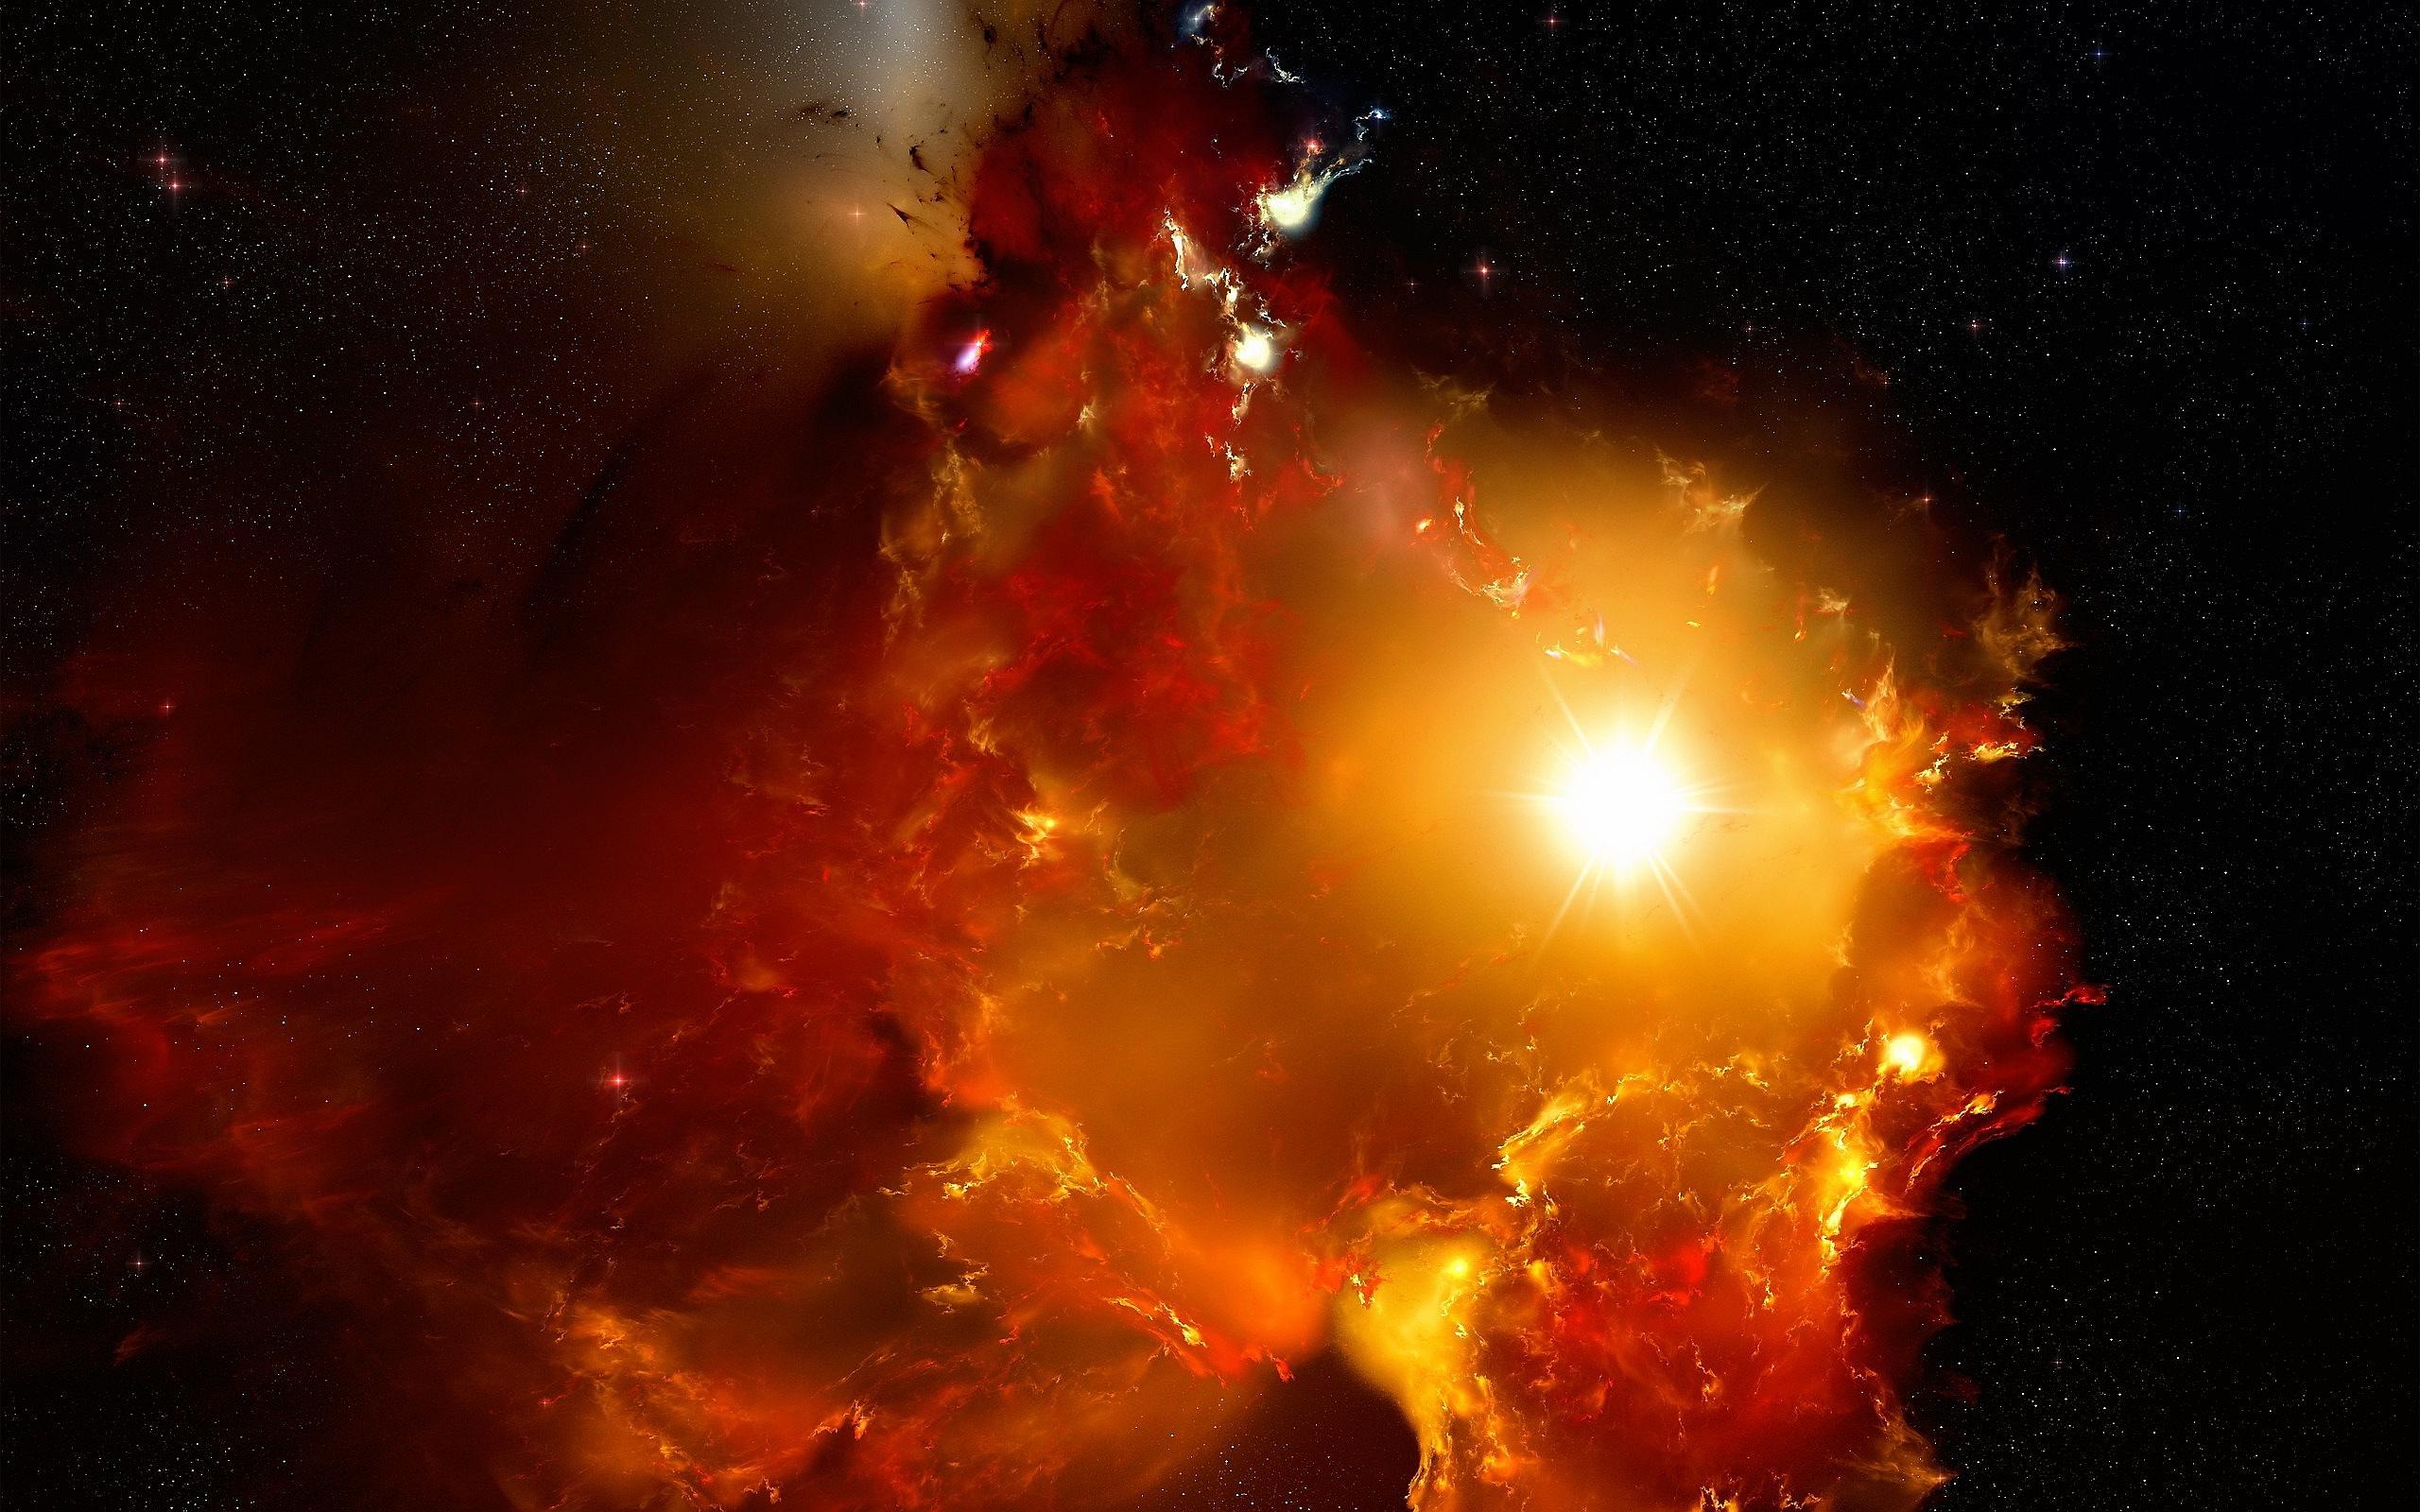 Red Nebula Clouds